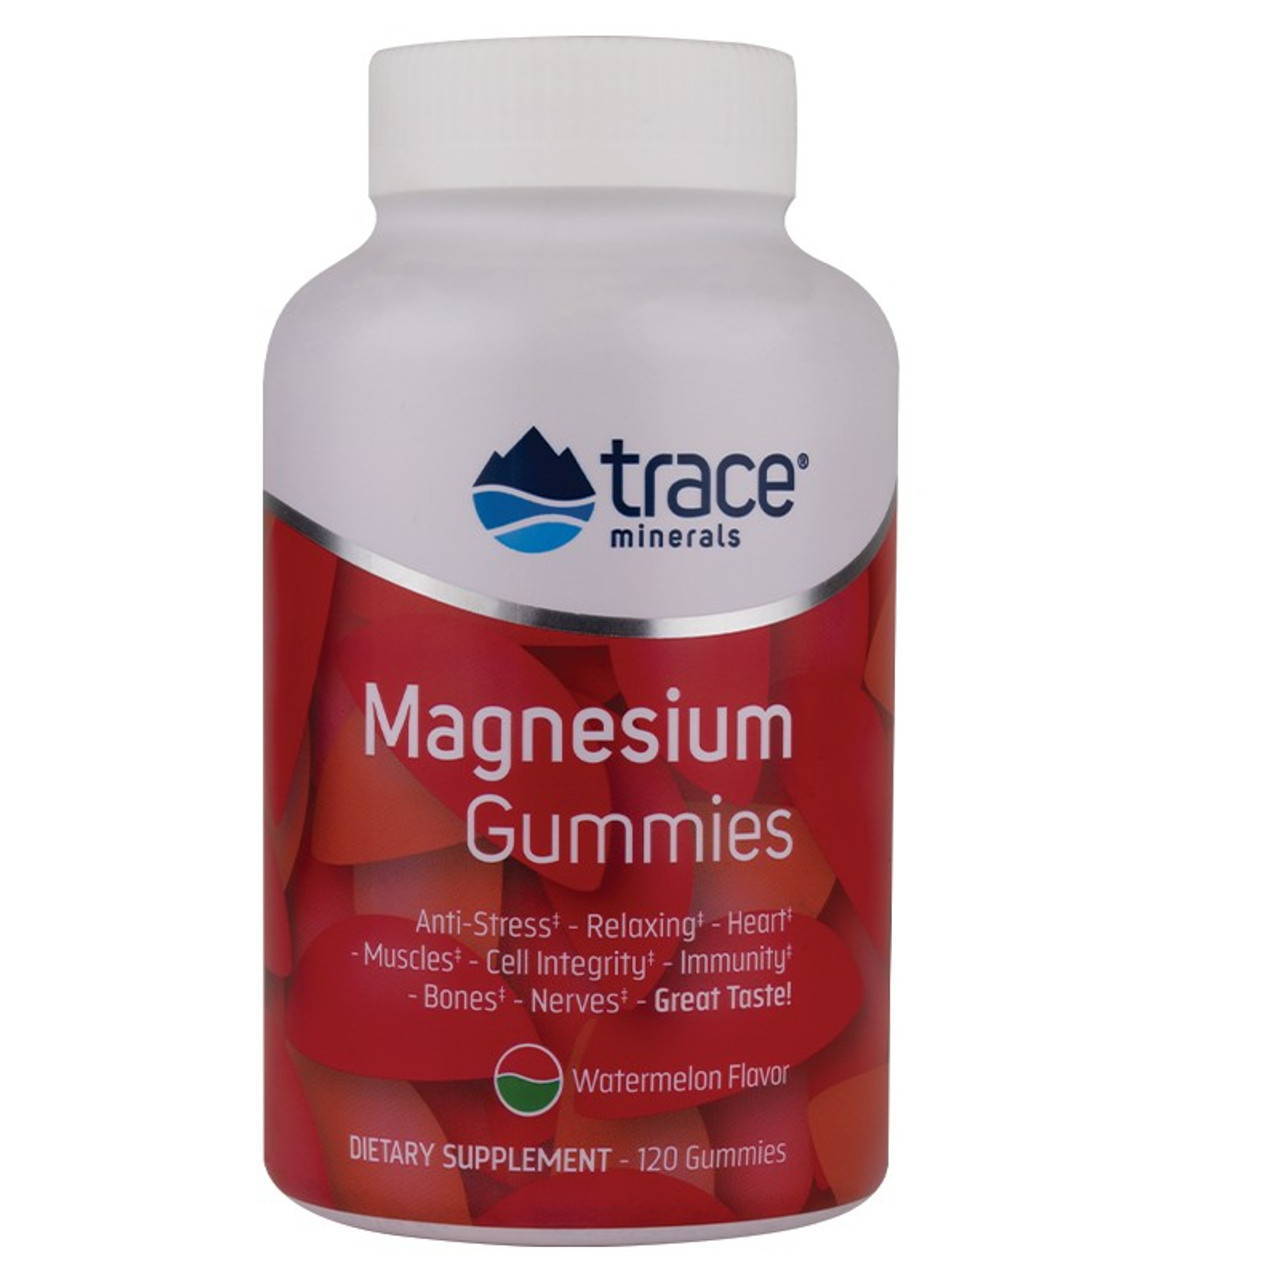 Trace Minerals Magnesium Gummies Watermelon